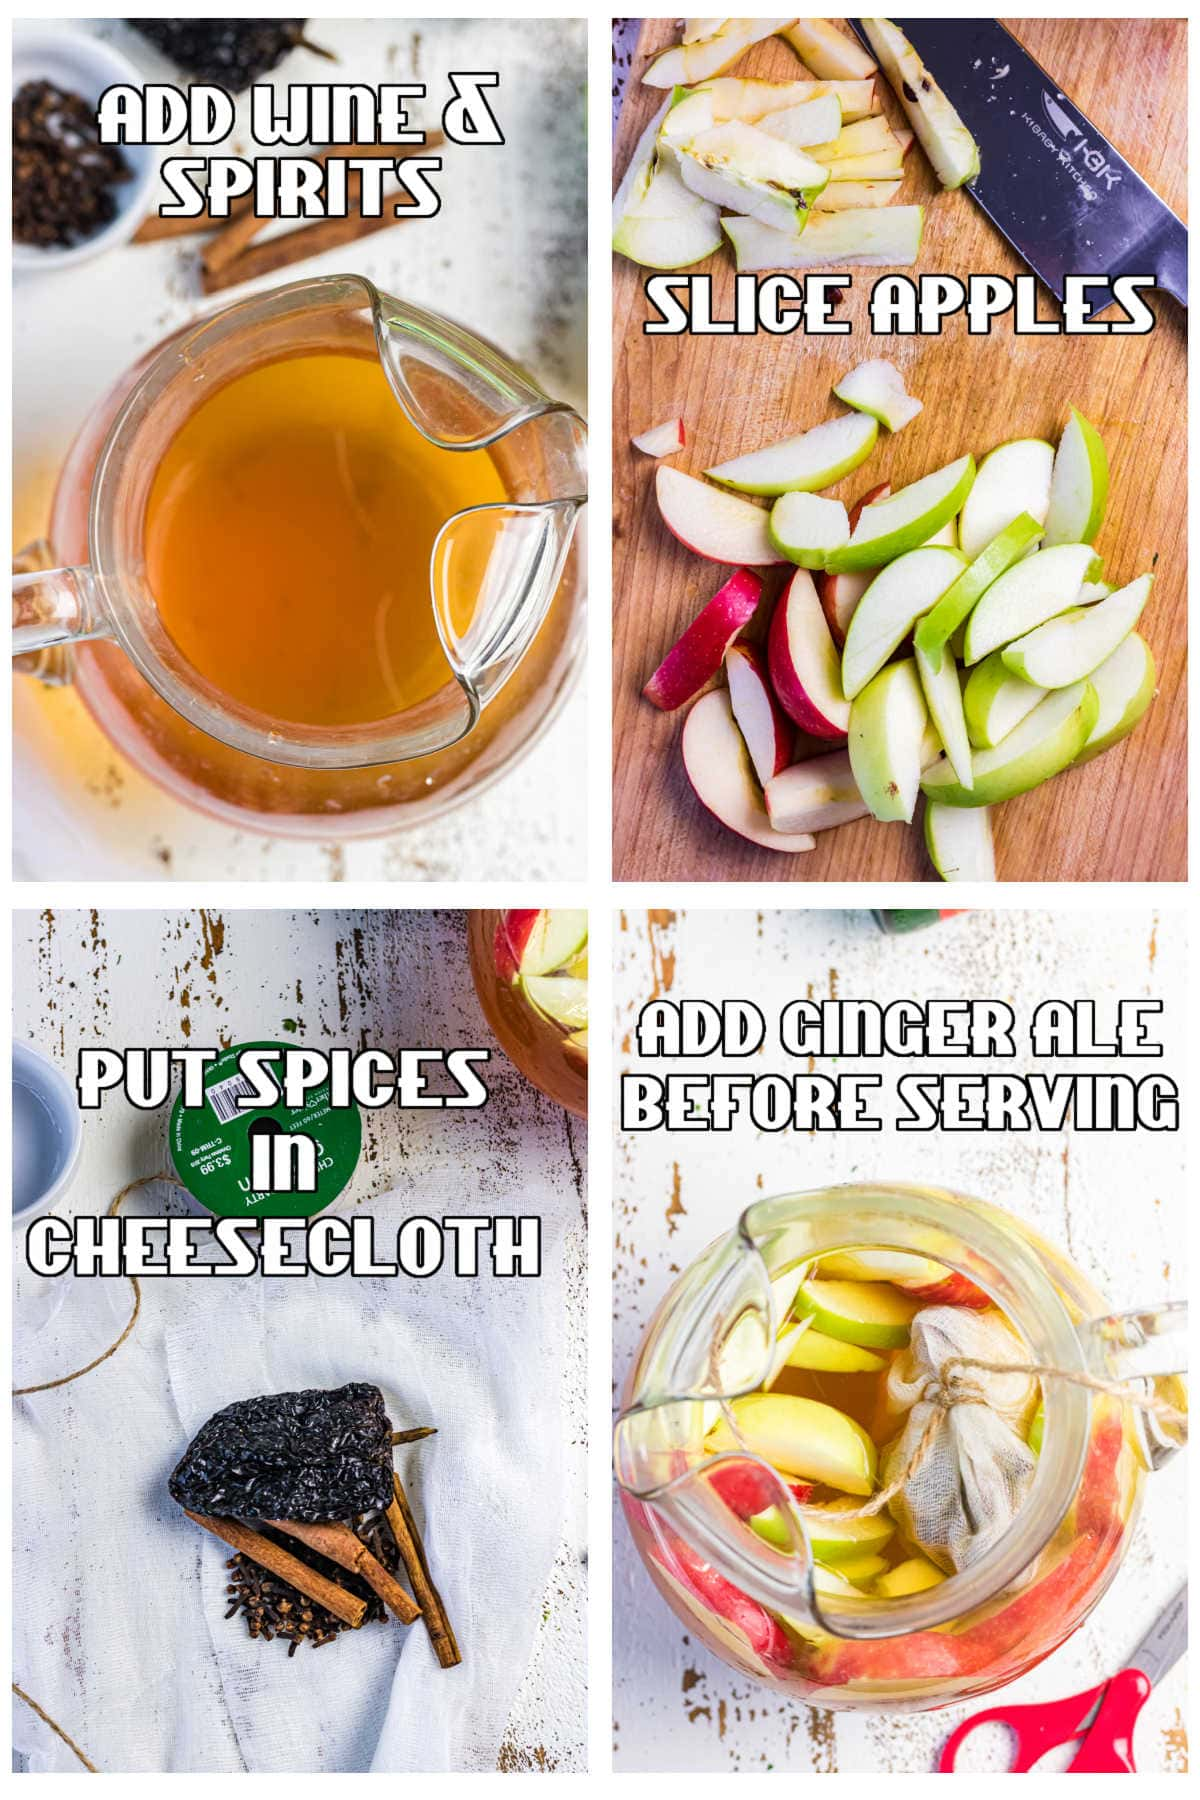 Step by step images for making apple cider sangria.